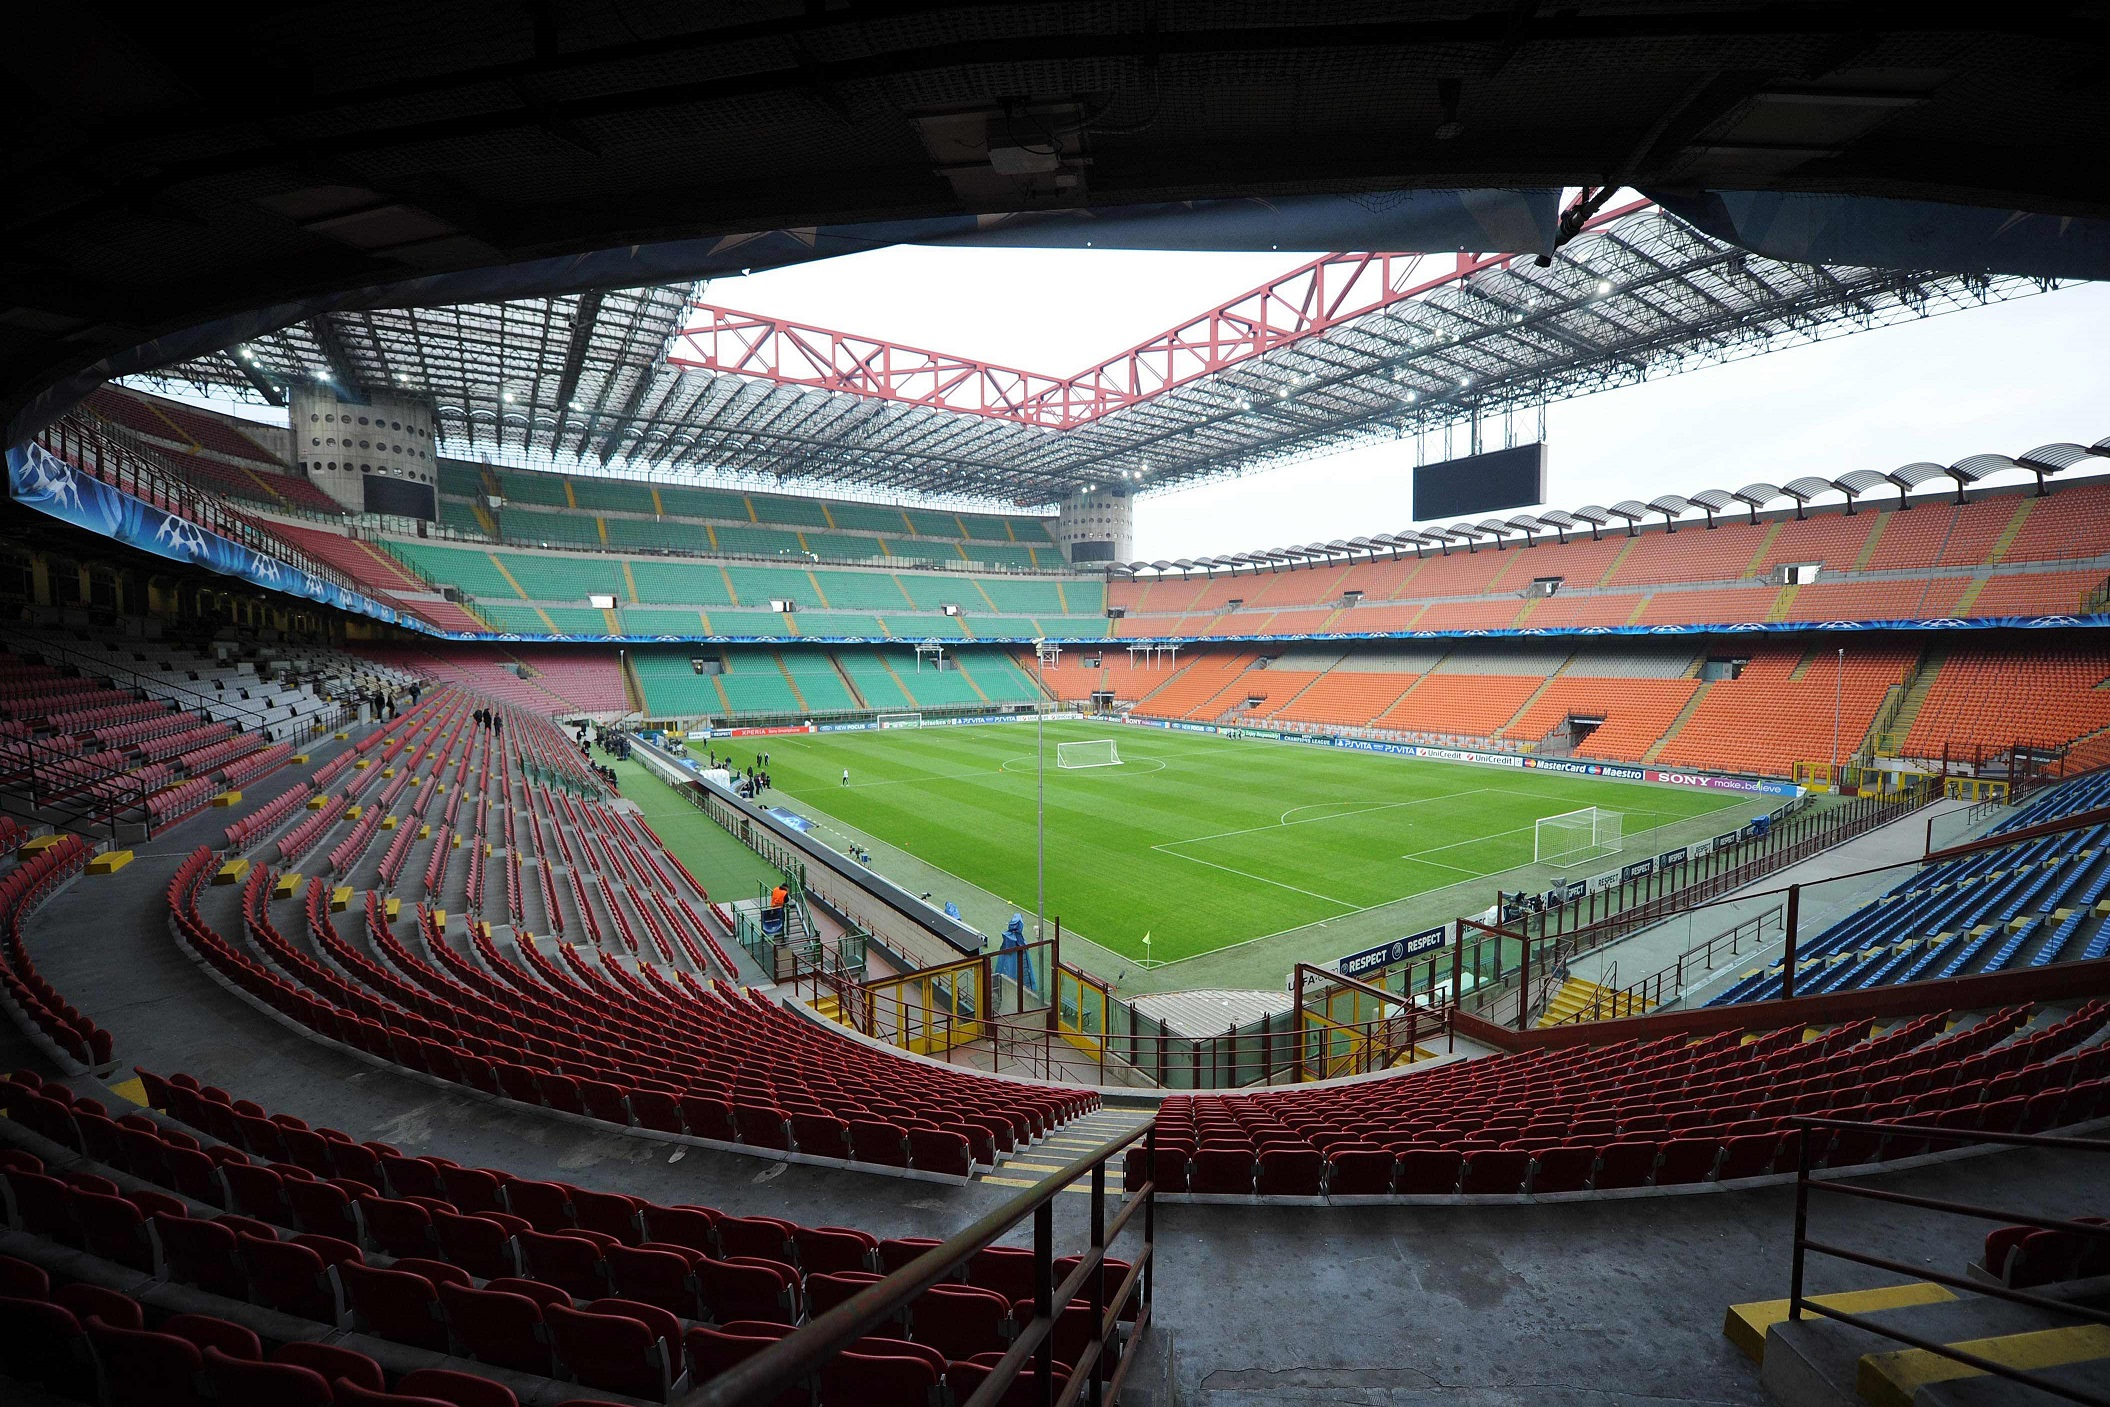 San Siro Giuseppe Meazza Info Stades